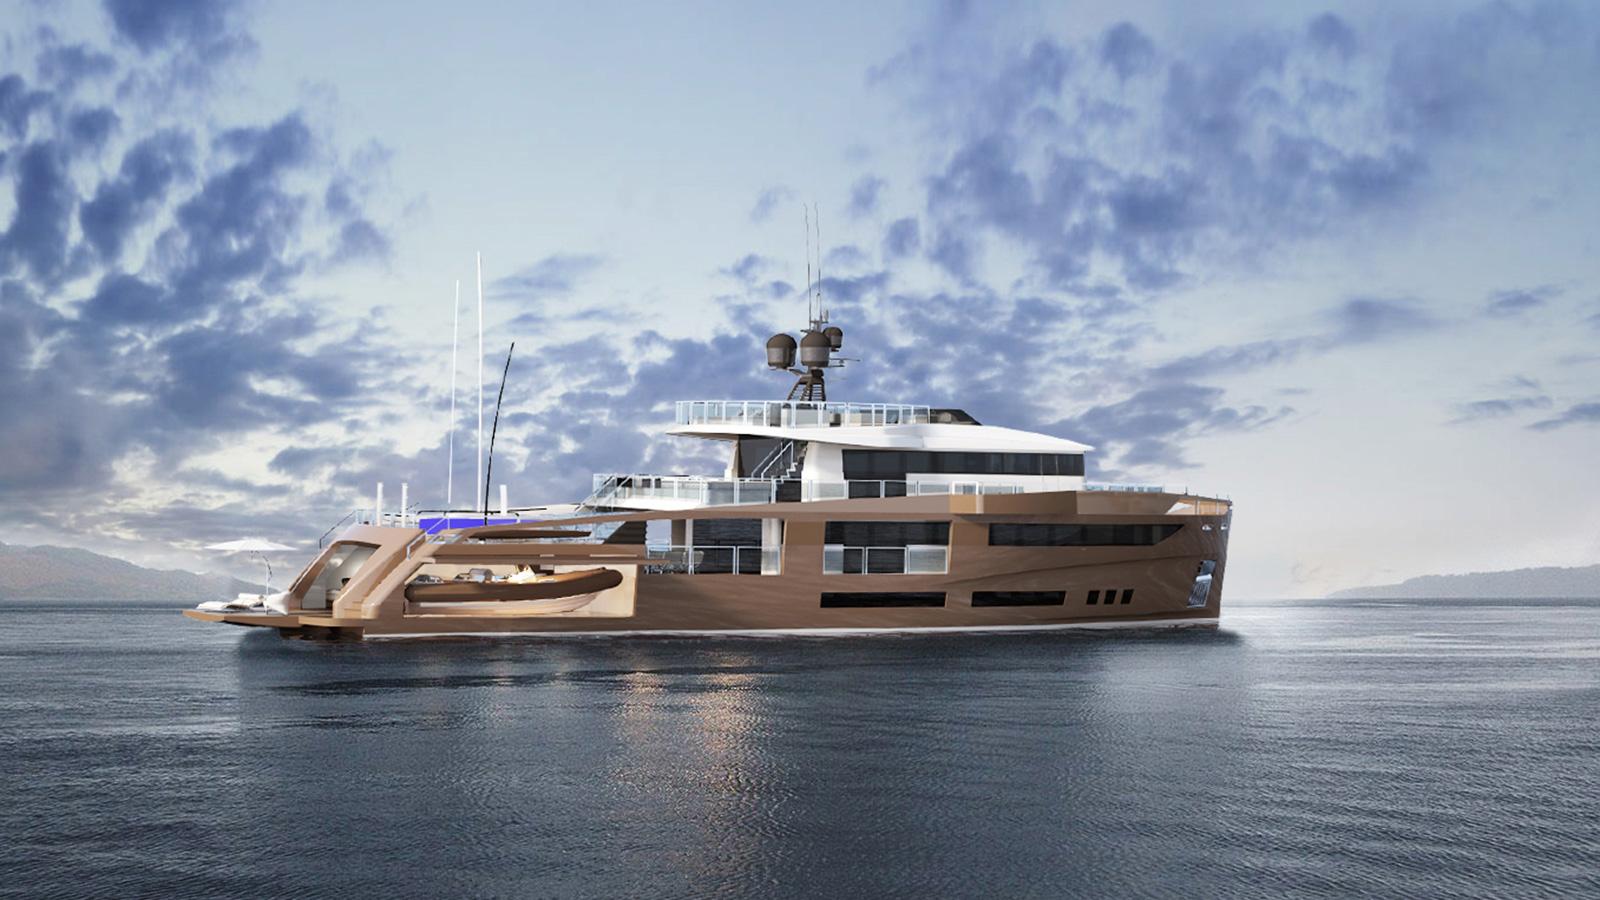 portside-aspect-of-the-oceanemo-33-explorer-yacht-concept